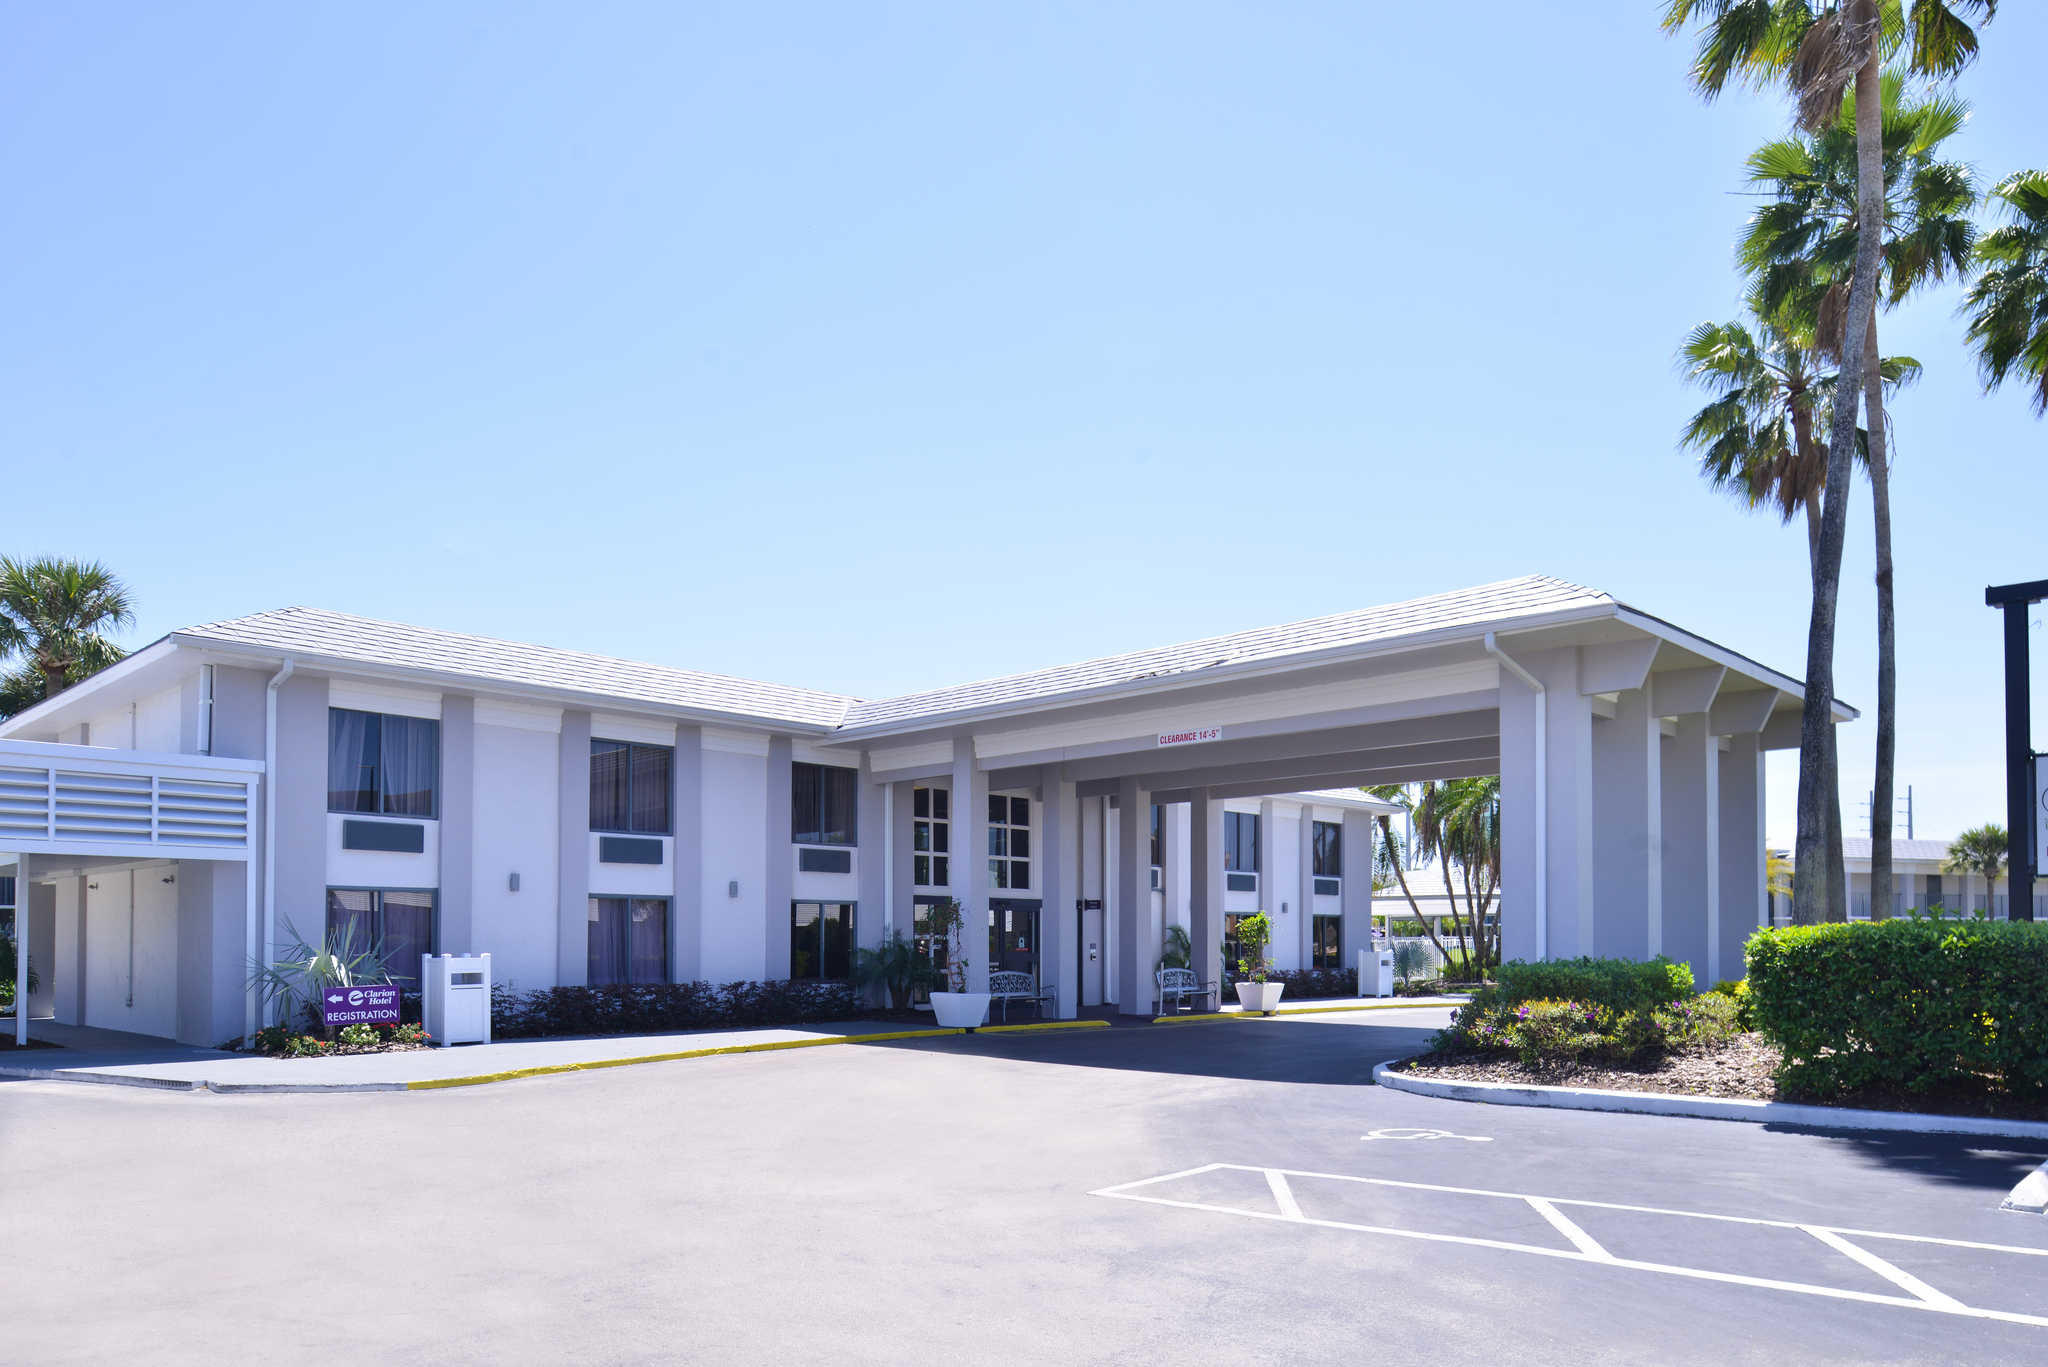 Clarion Inn & Suites Orlando near Theme Parks image 2